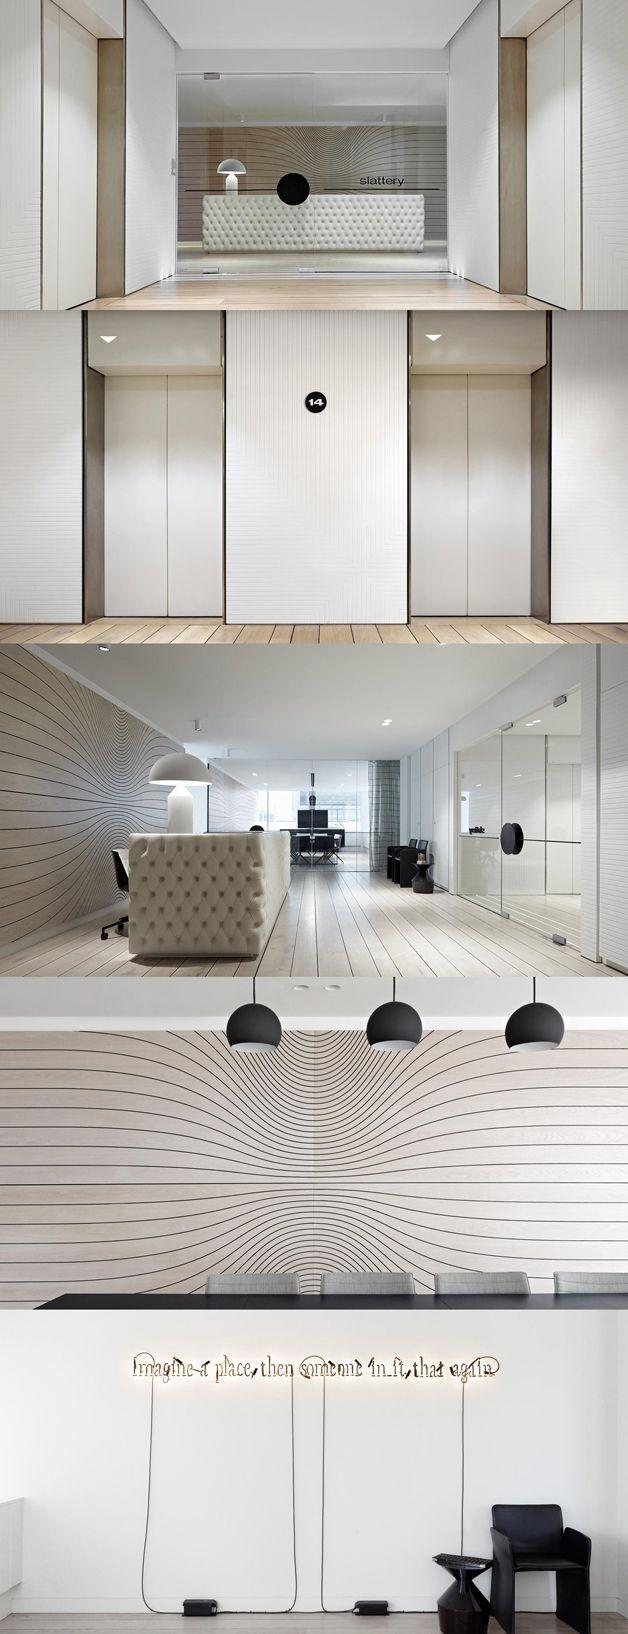 Slattery australia office by elenberg fraser architecture - Interior design schools in boston ...